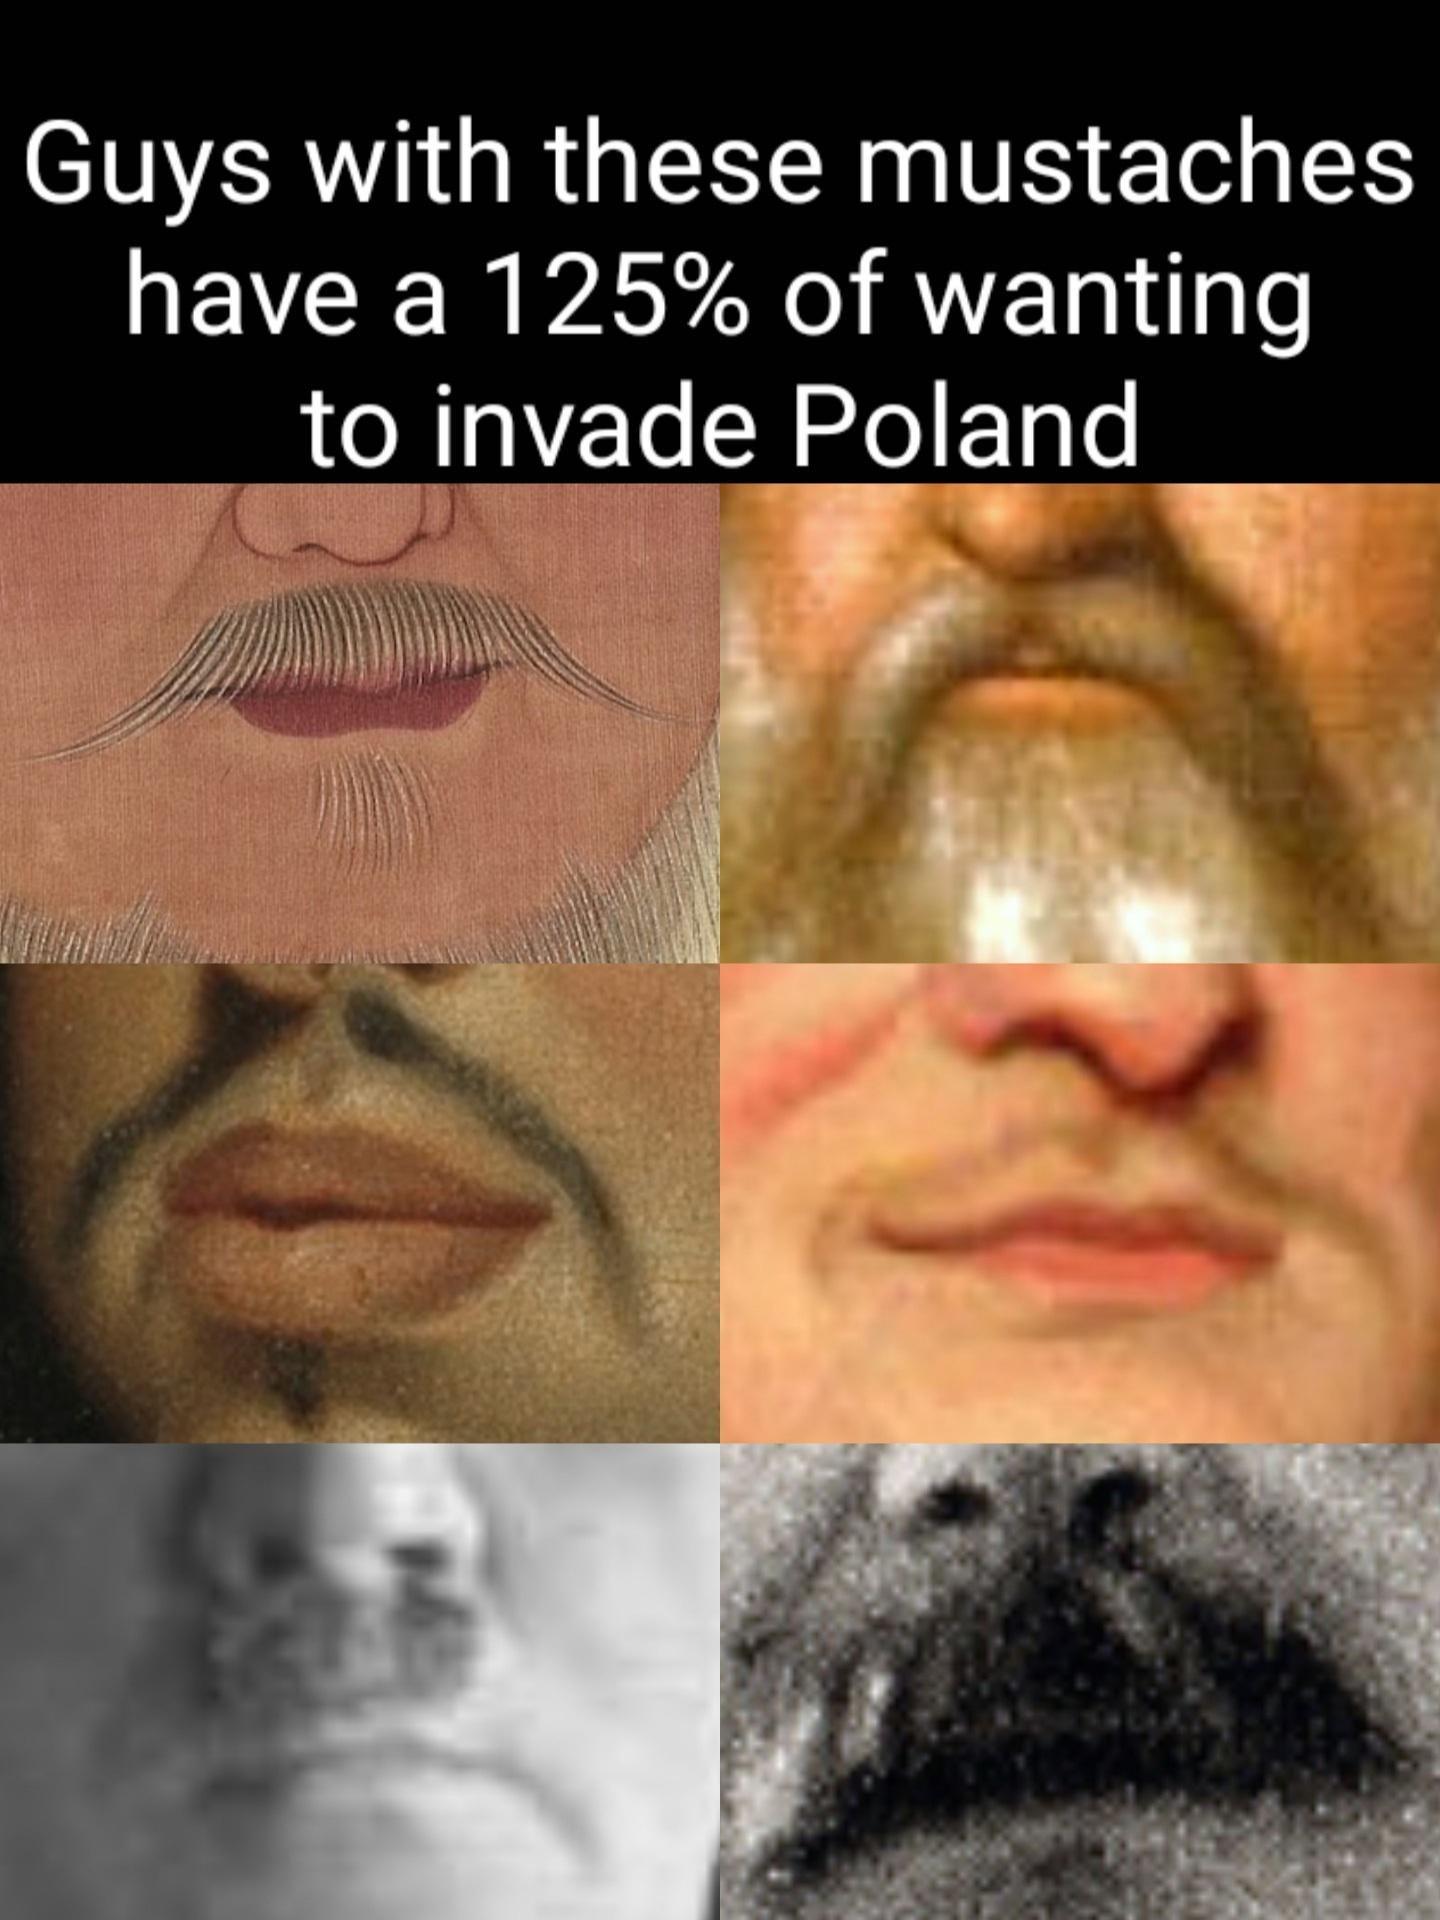 Genghis, Vasili, Charles, Frederick Wilhelm, Hitler and Stalin